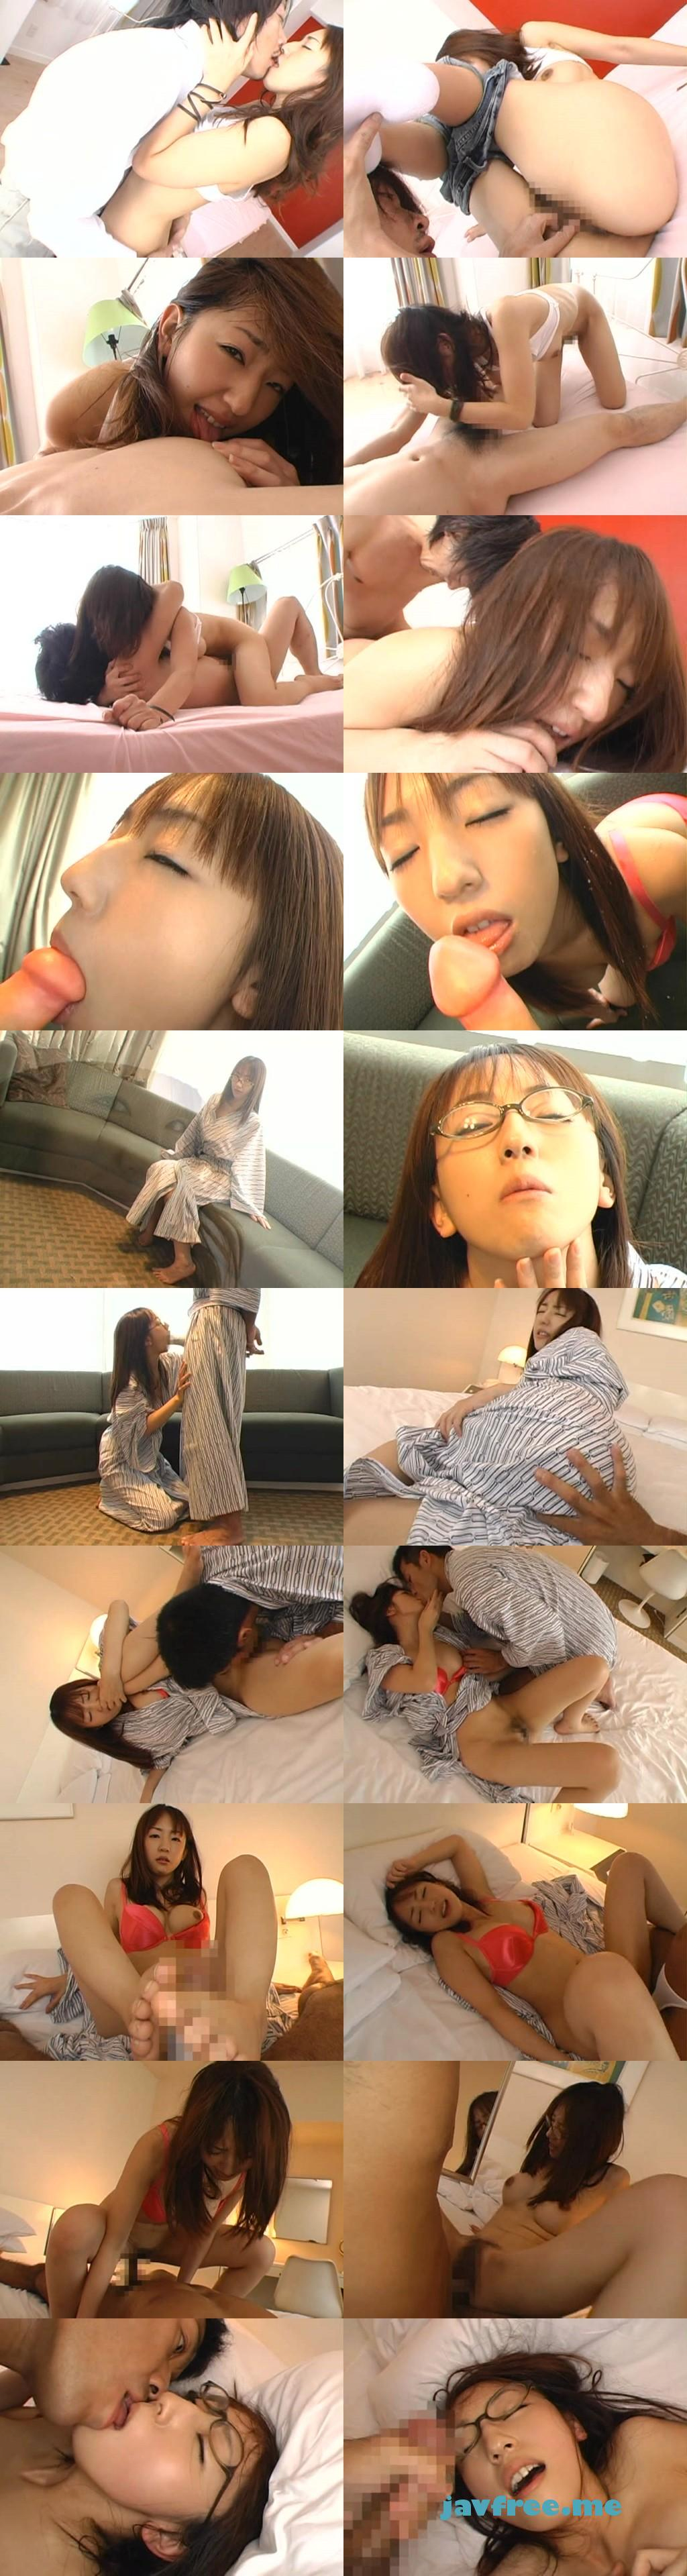 [DDN-109] 接吻、密室、天衣みつ。 すごくイヤラシいセックス。 - image DDN109 on https://javfree.me